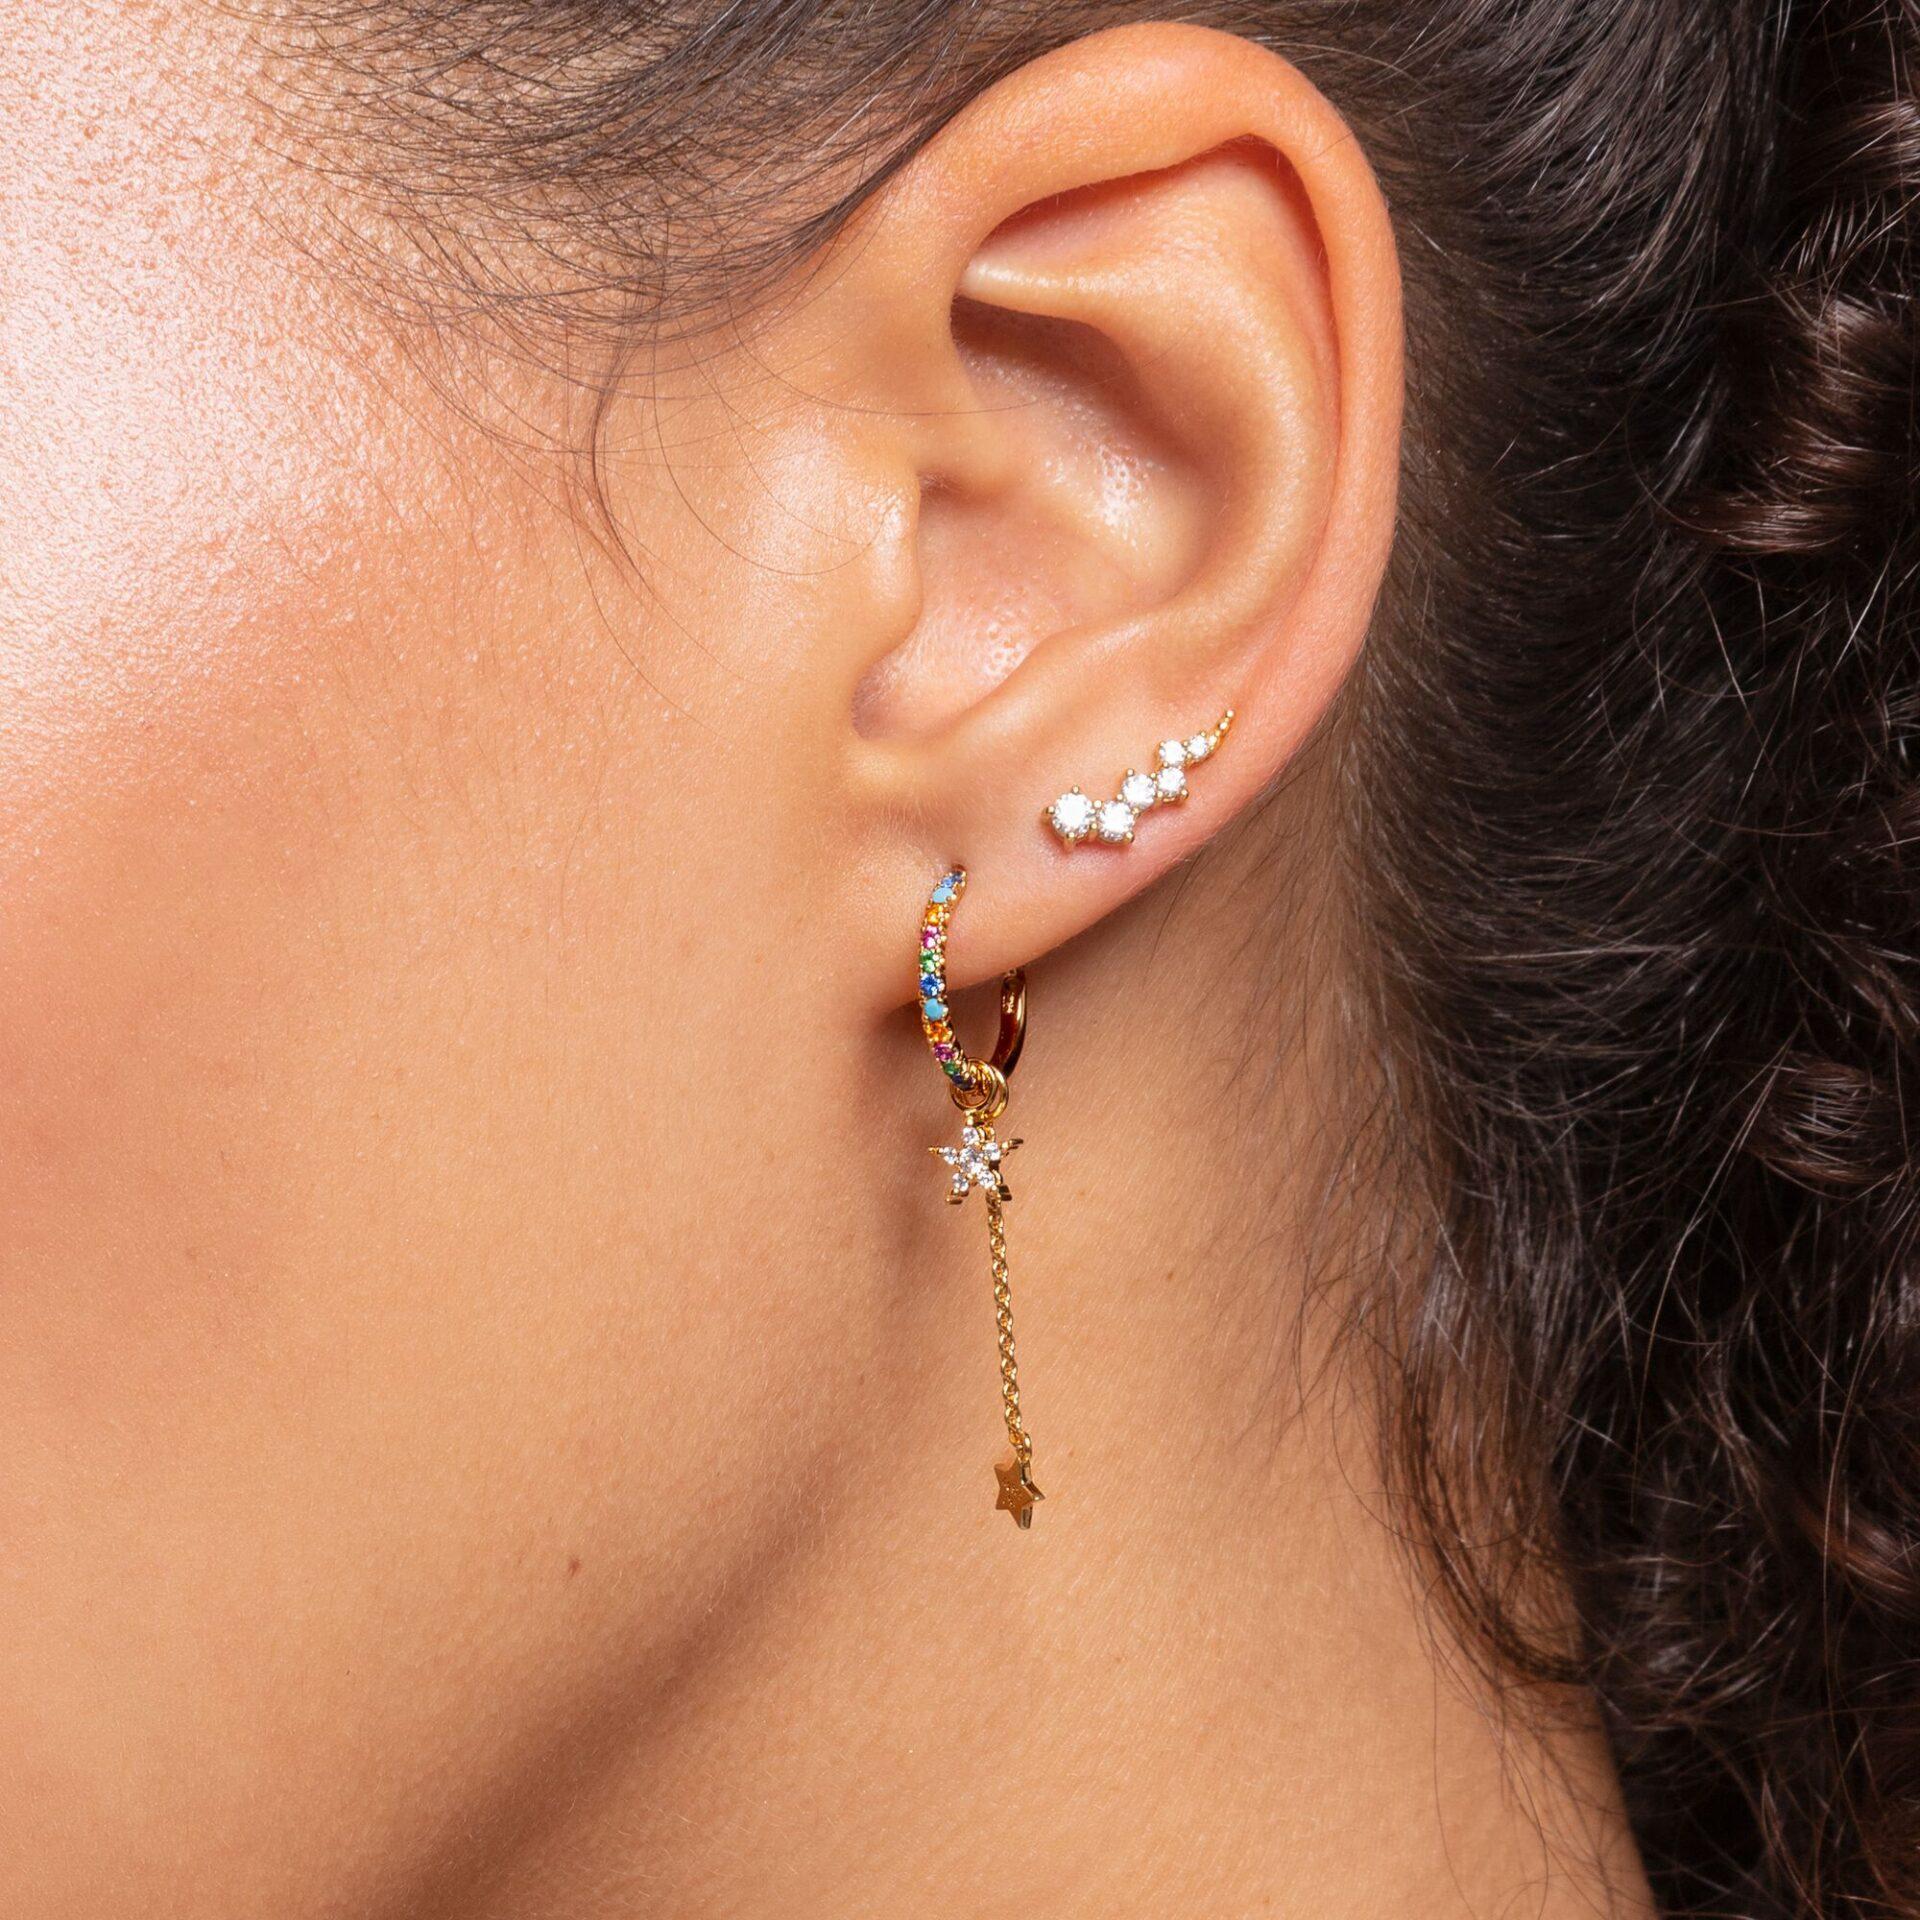 Boucles d'oreilles grimpante blanche pierres or, Thomas Sabo